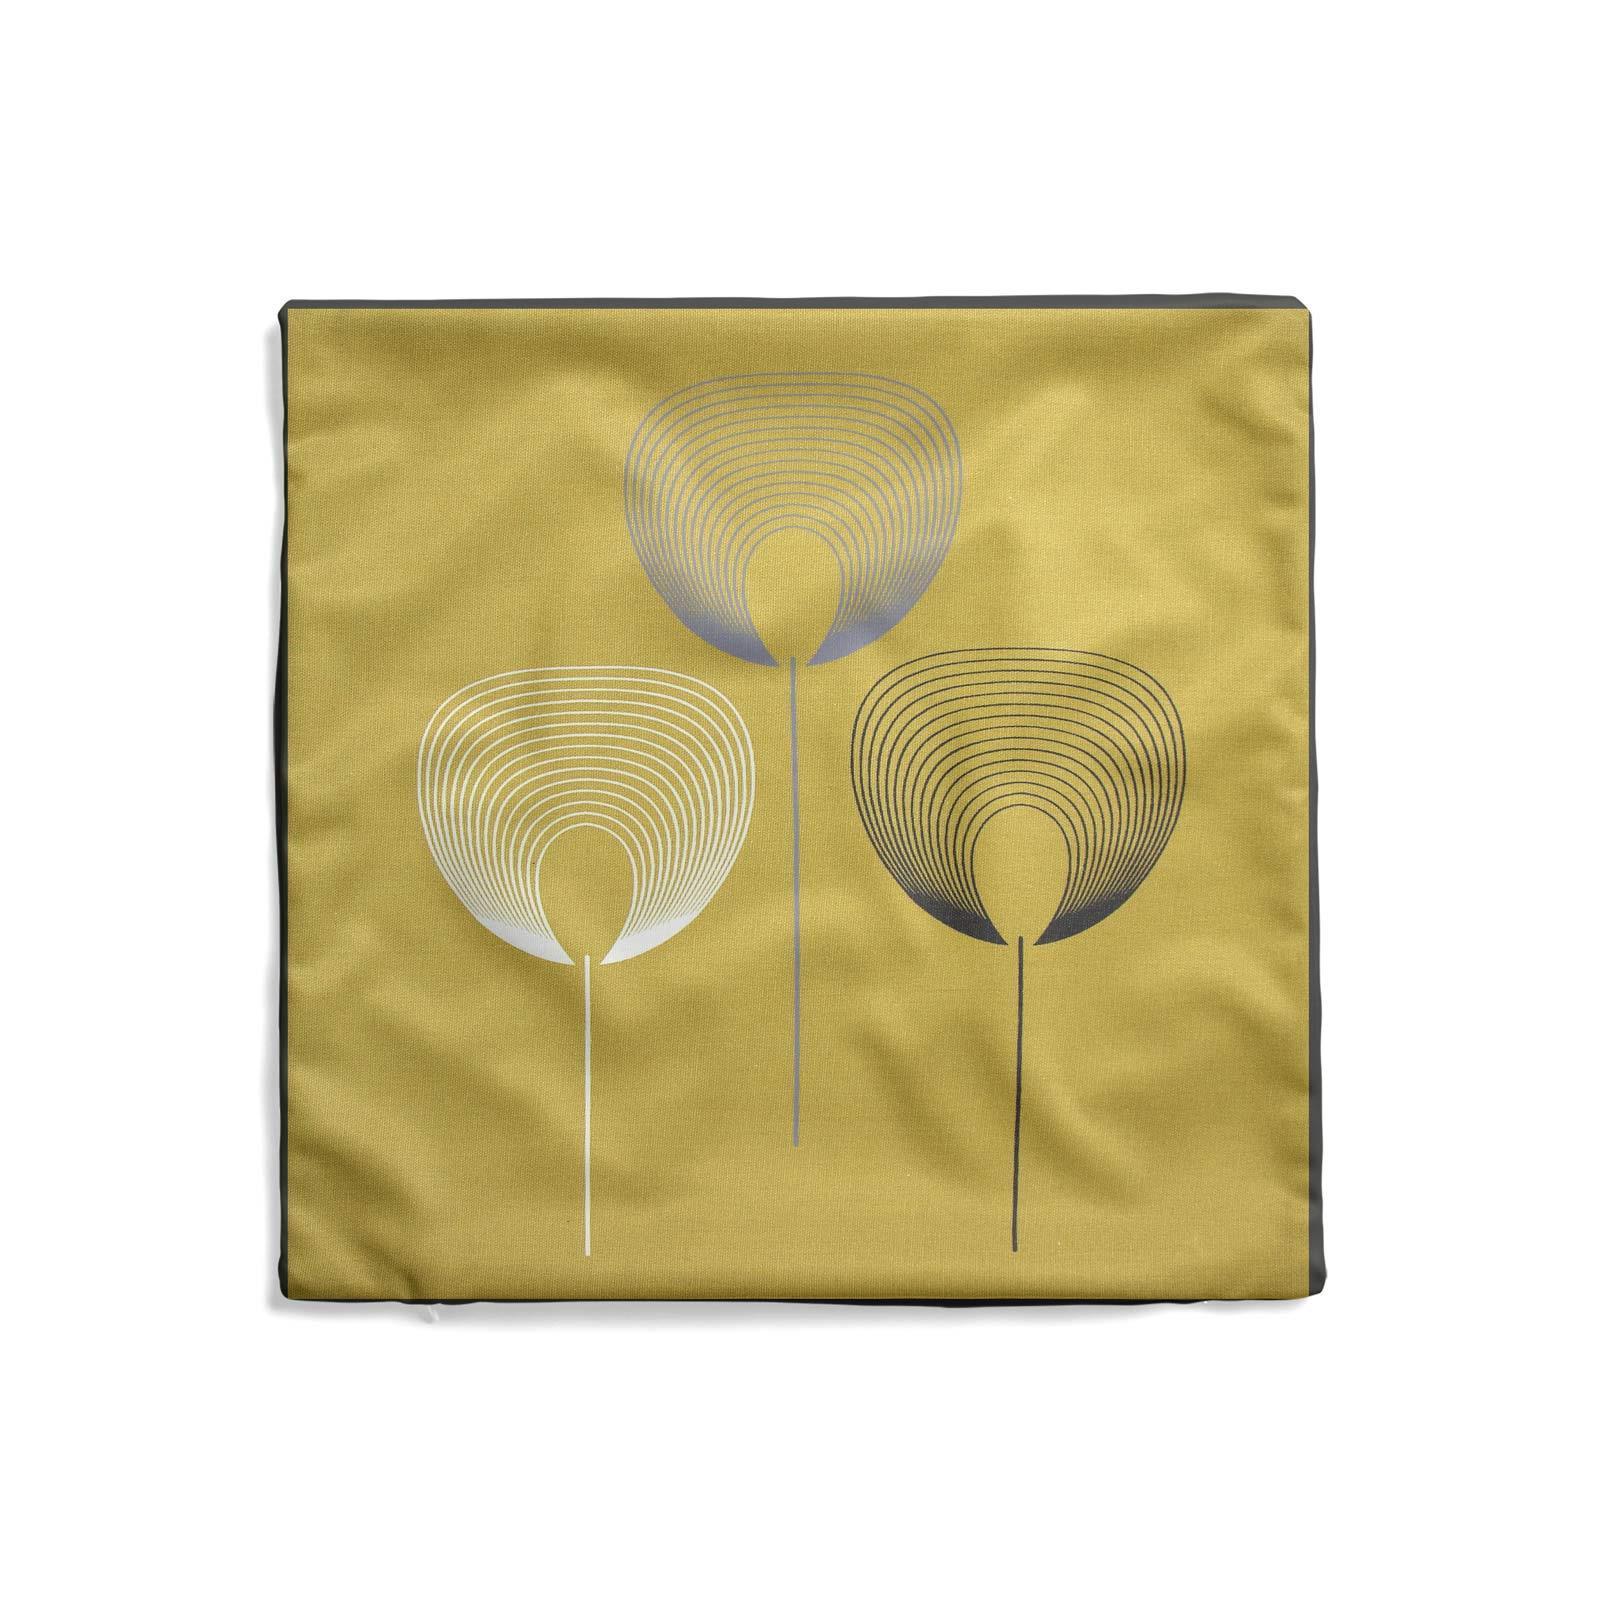 Geometrica-Cushion-Covers-Cojines-De-Impresion-Floral-Gris-Beige-Ocre-cubre-17-034-X-17-034 miniatura 4